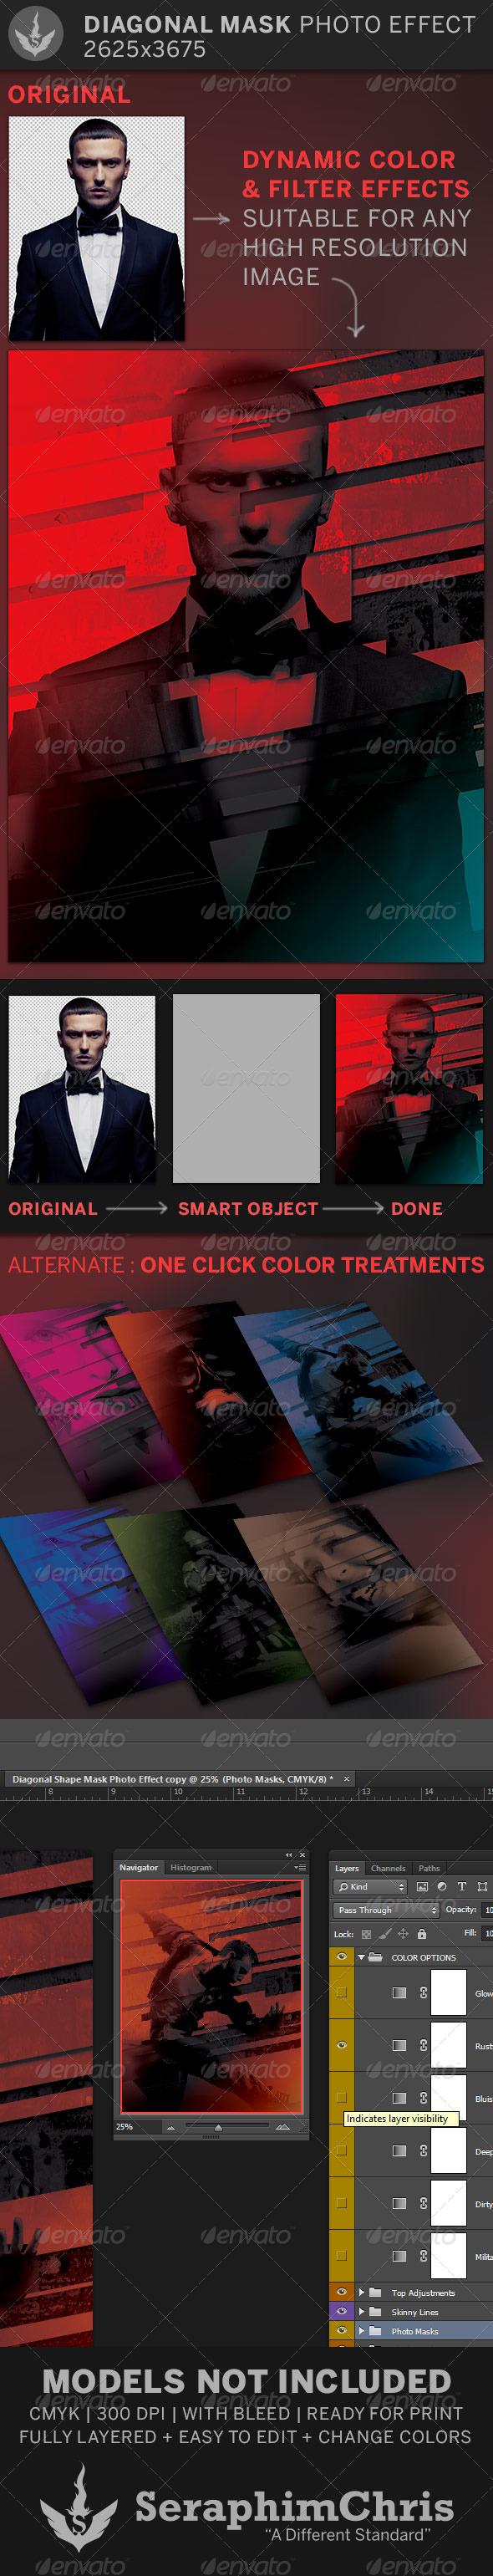 Diagonal Mask Photo Effect Template - Artistic Photo Templates